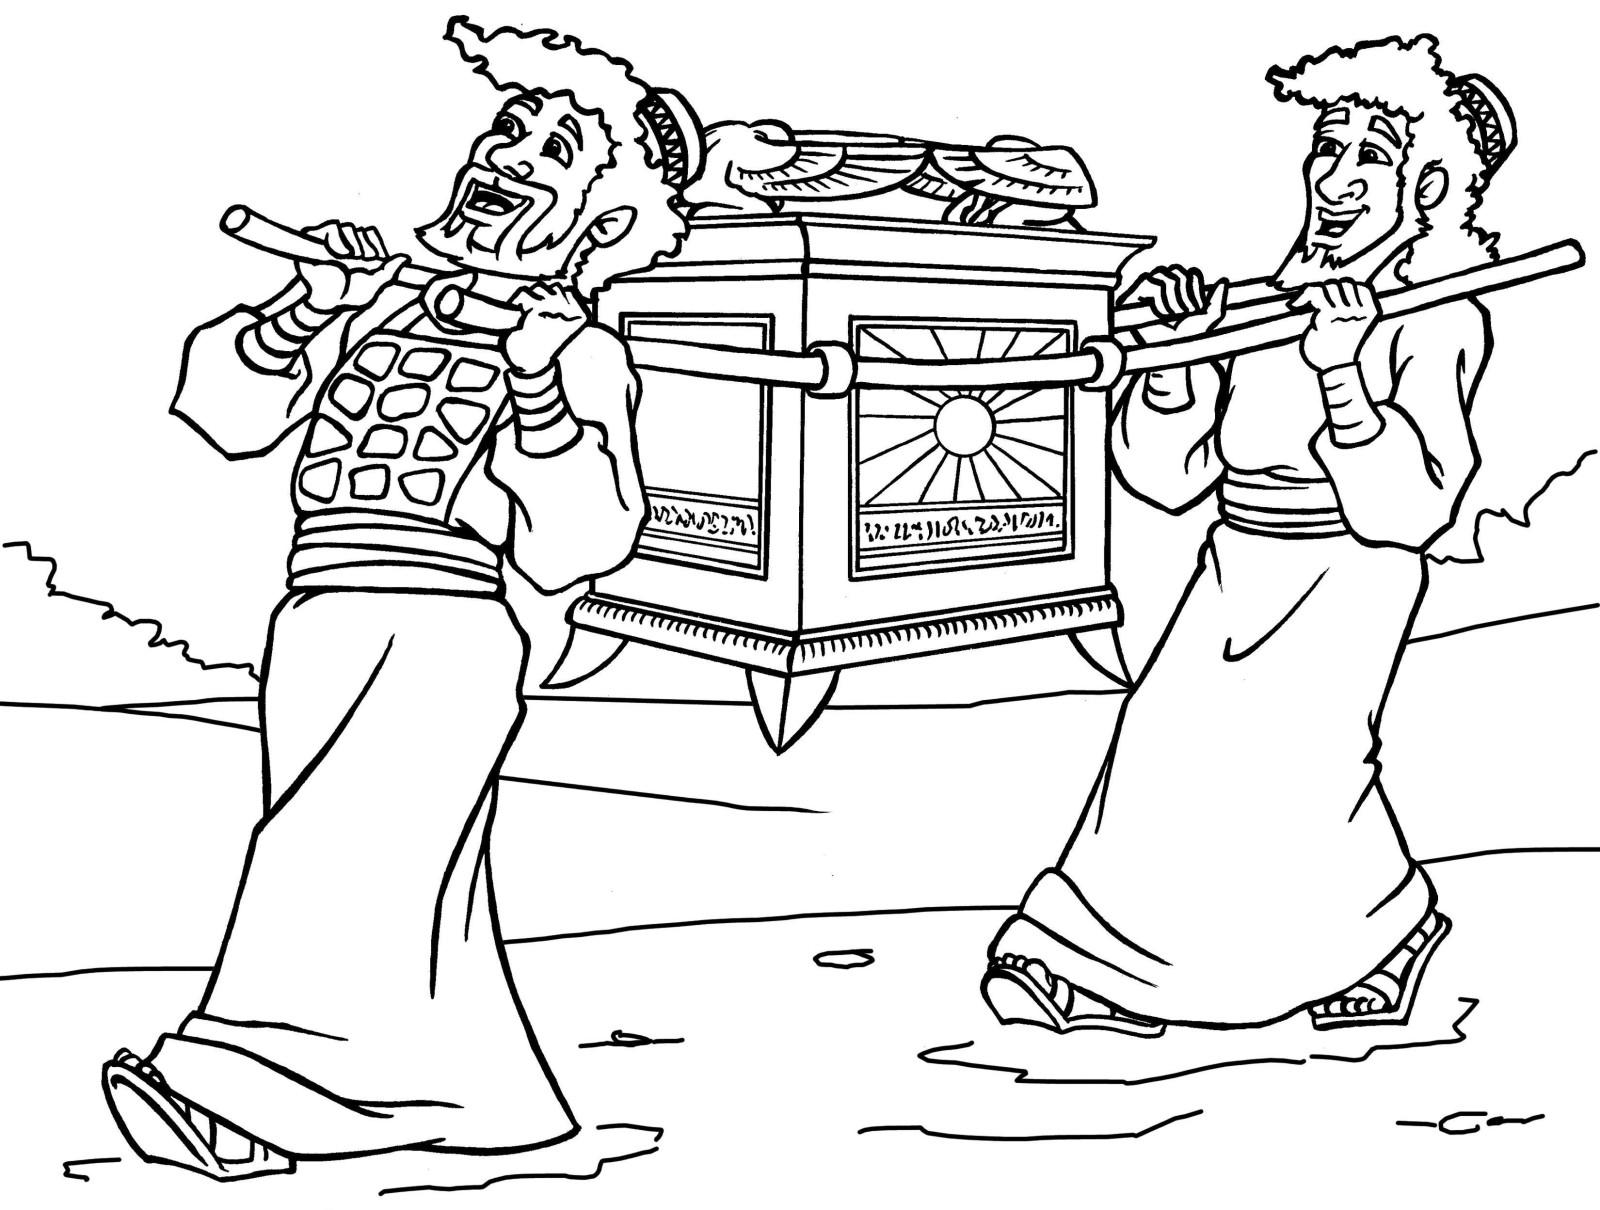 Tabernacle Coloring Pages Tabernacle Coloring Page